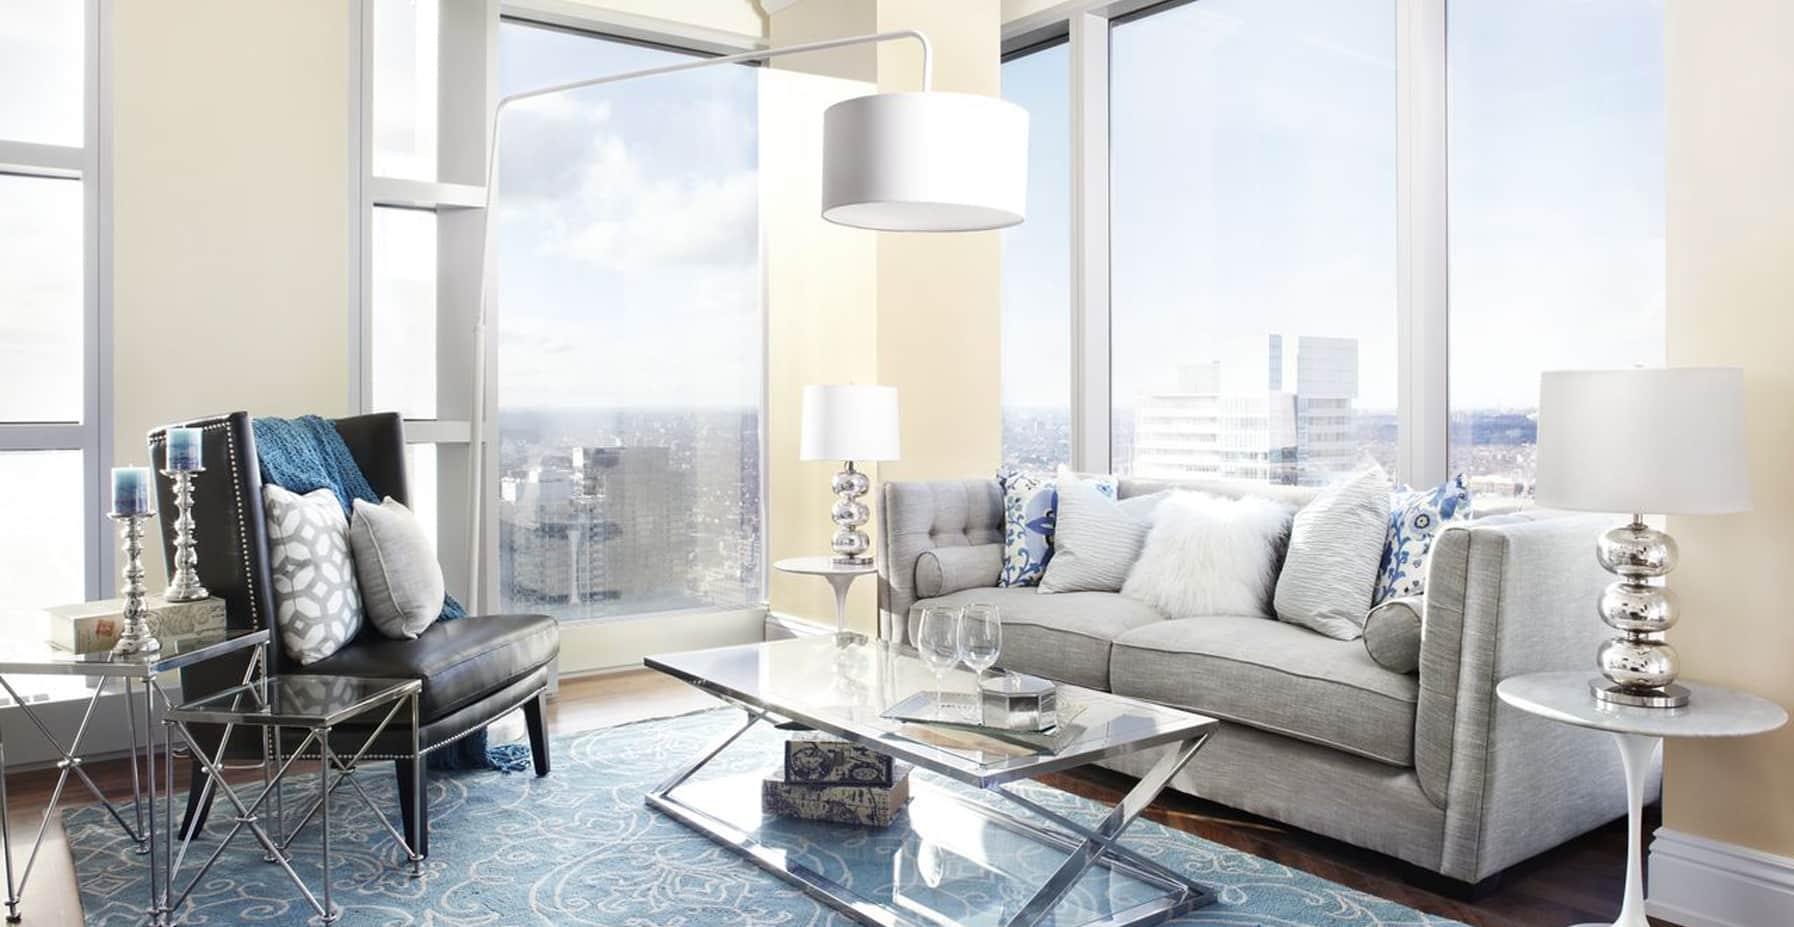 Surprising The Ritz Carlton Toronto Lux Design Download Free Architecture Designs Crovemadebymaigaardcom